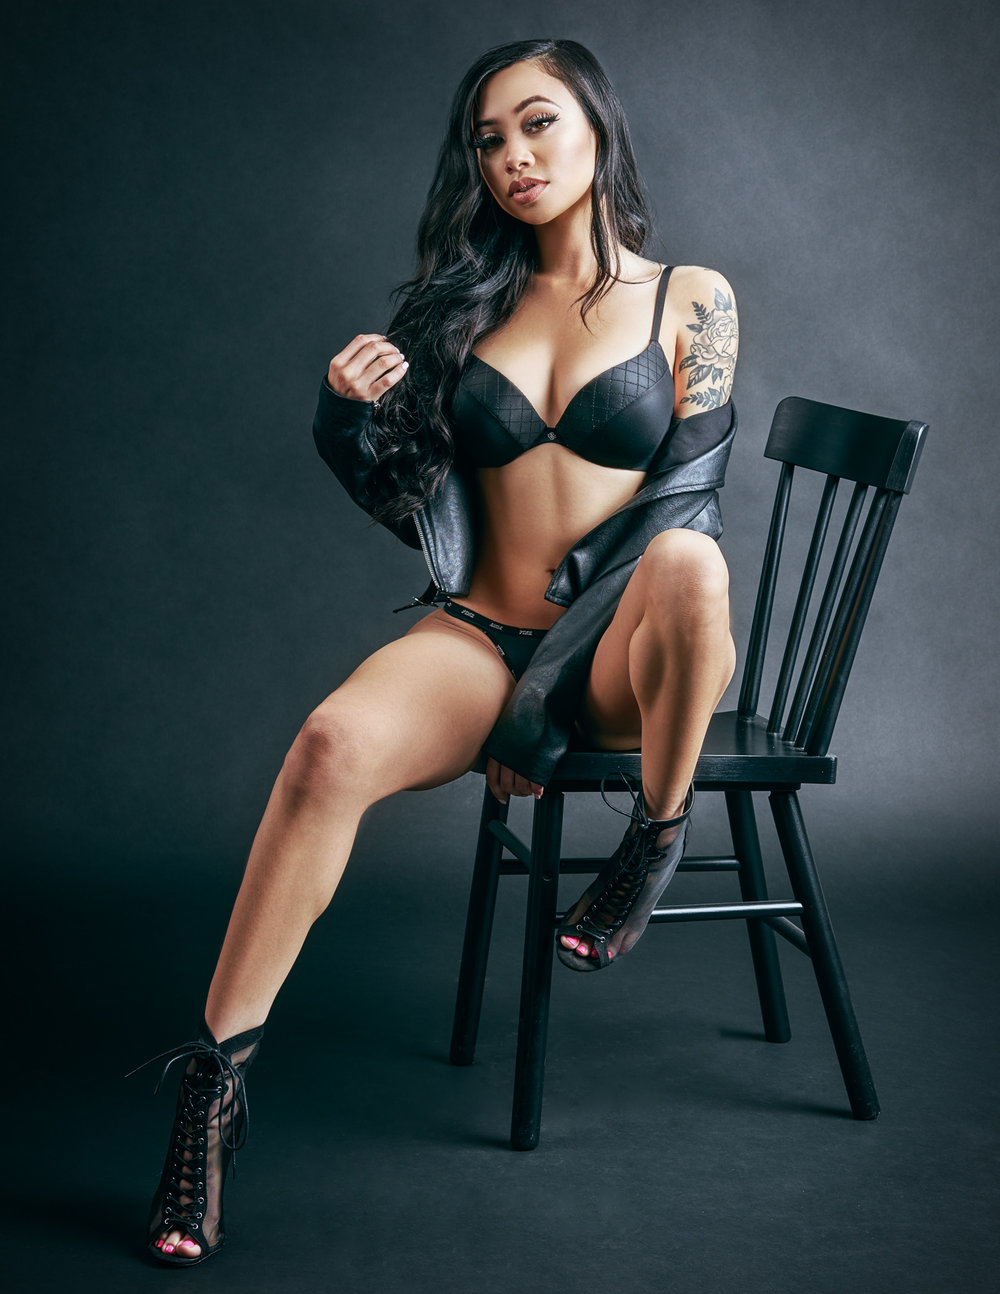 Alexxa Fashion Model by Mesa Arizona Fashion Photographer Chad Weed